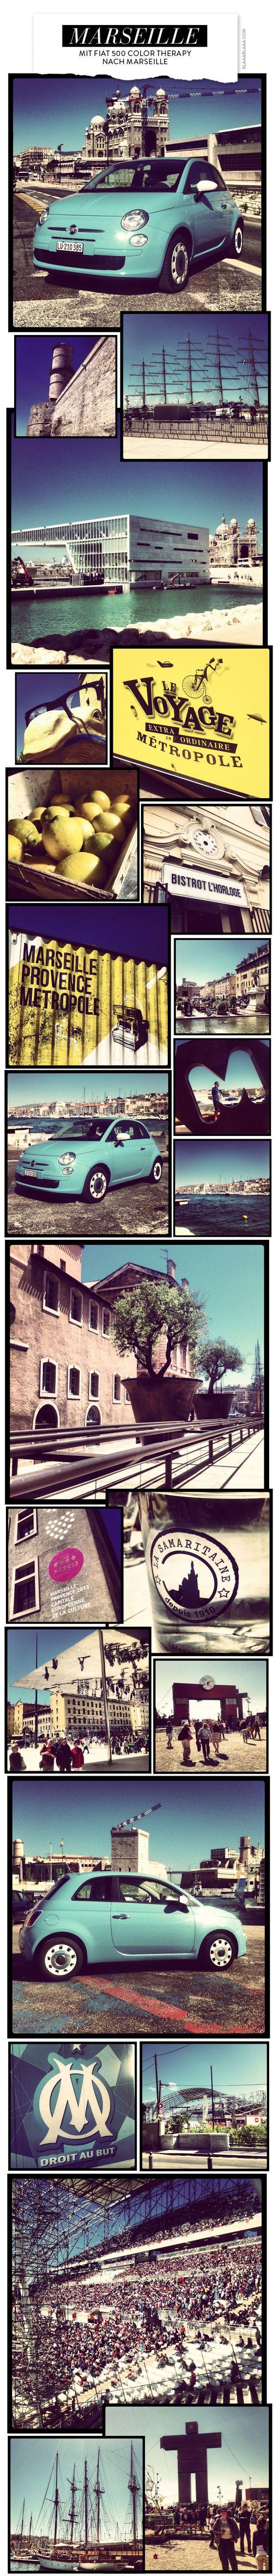 Mit Fiat 500 Color Therapy nach Marseille